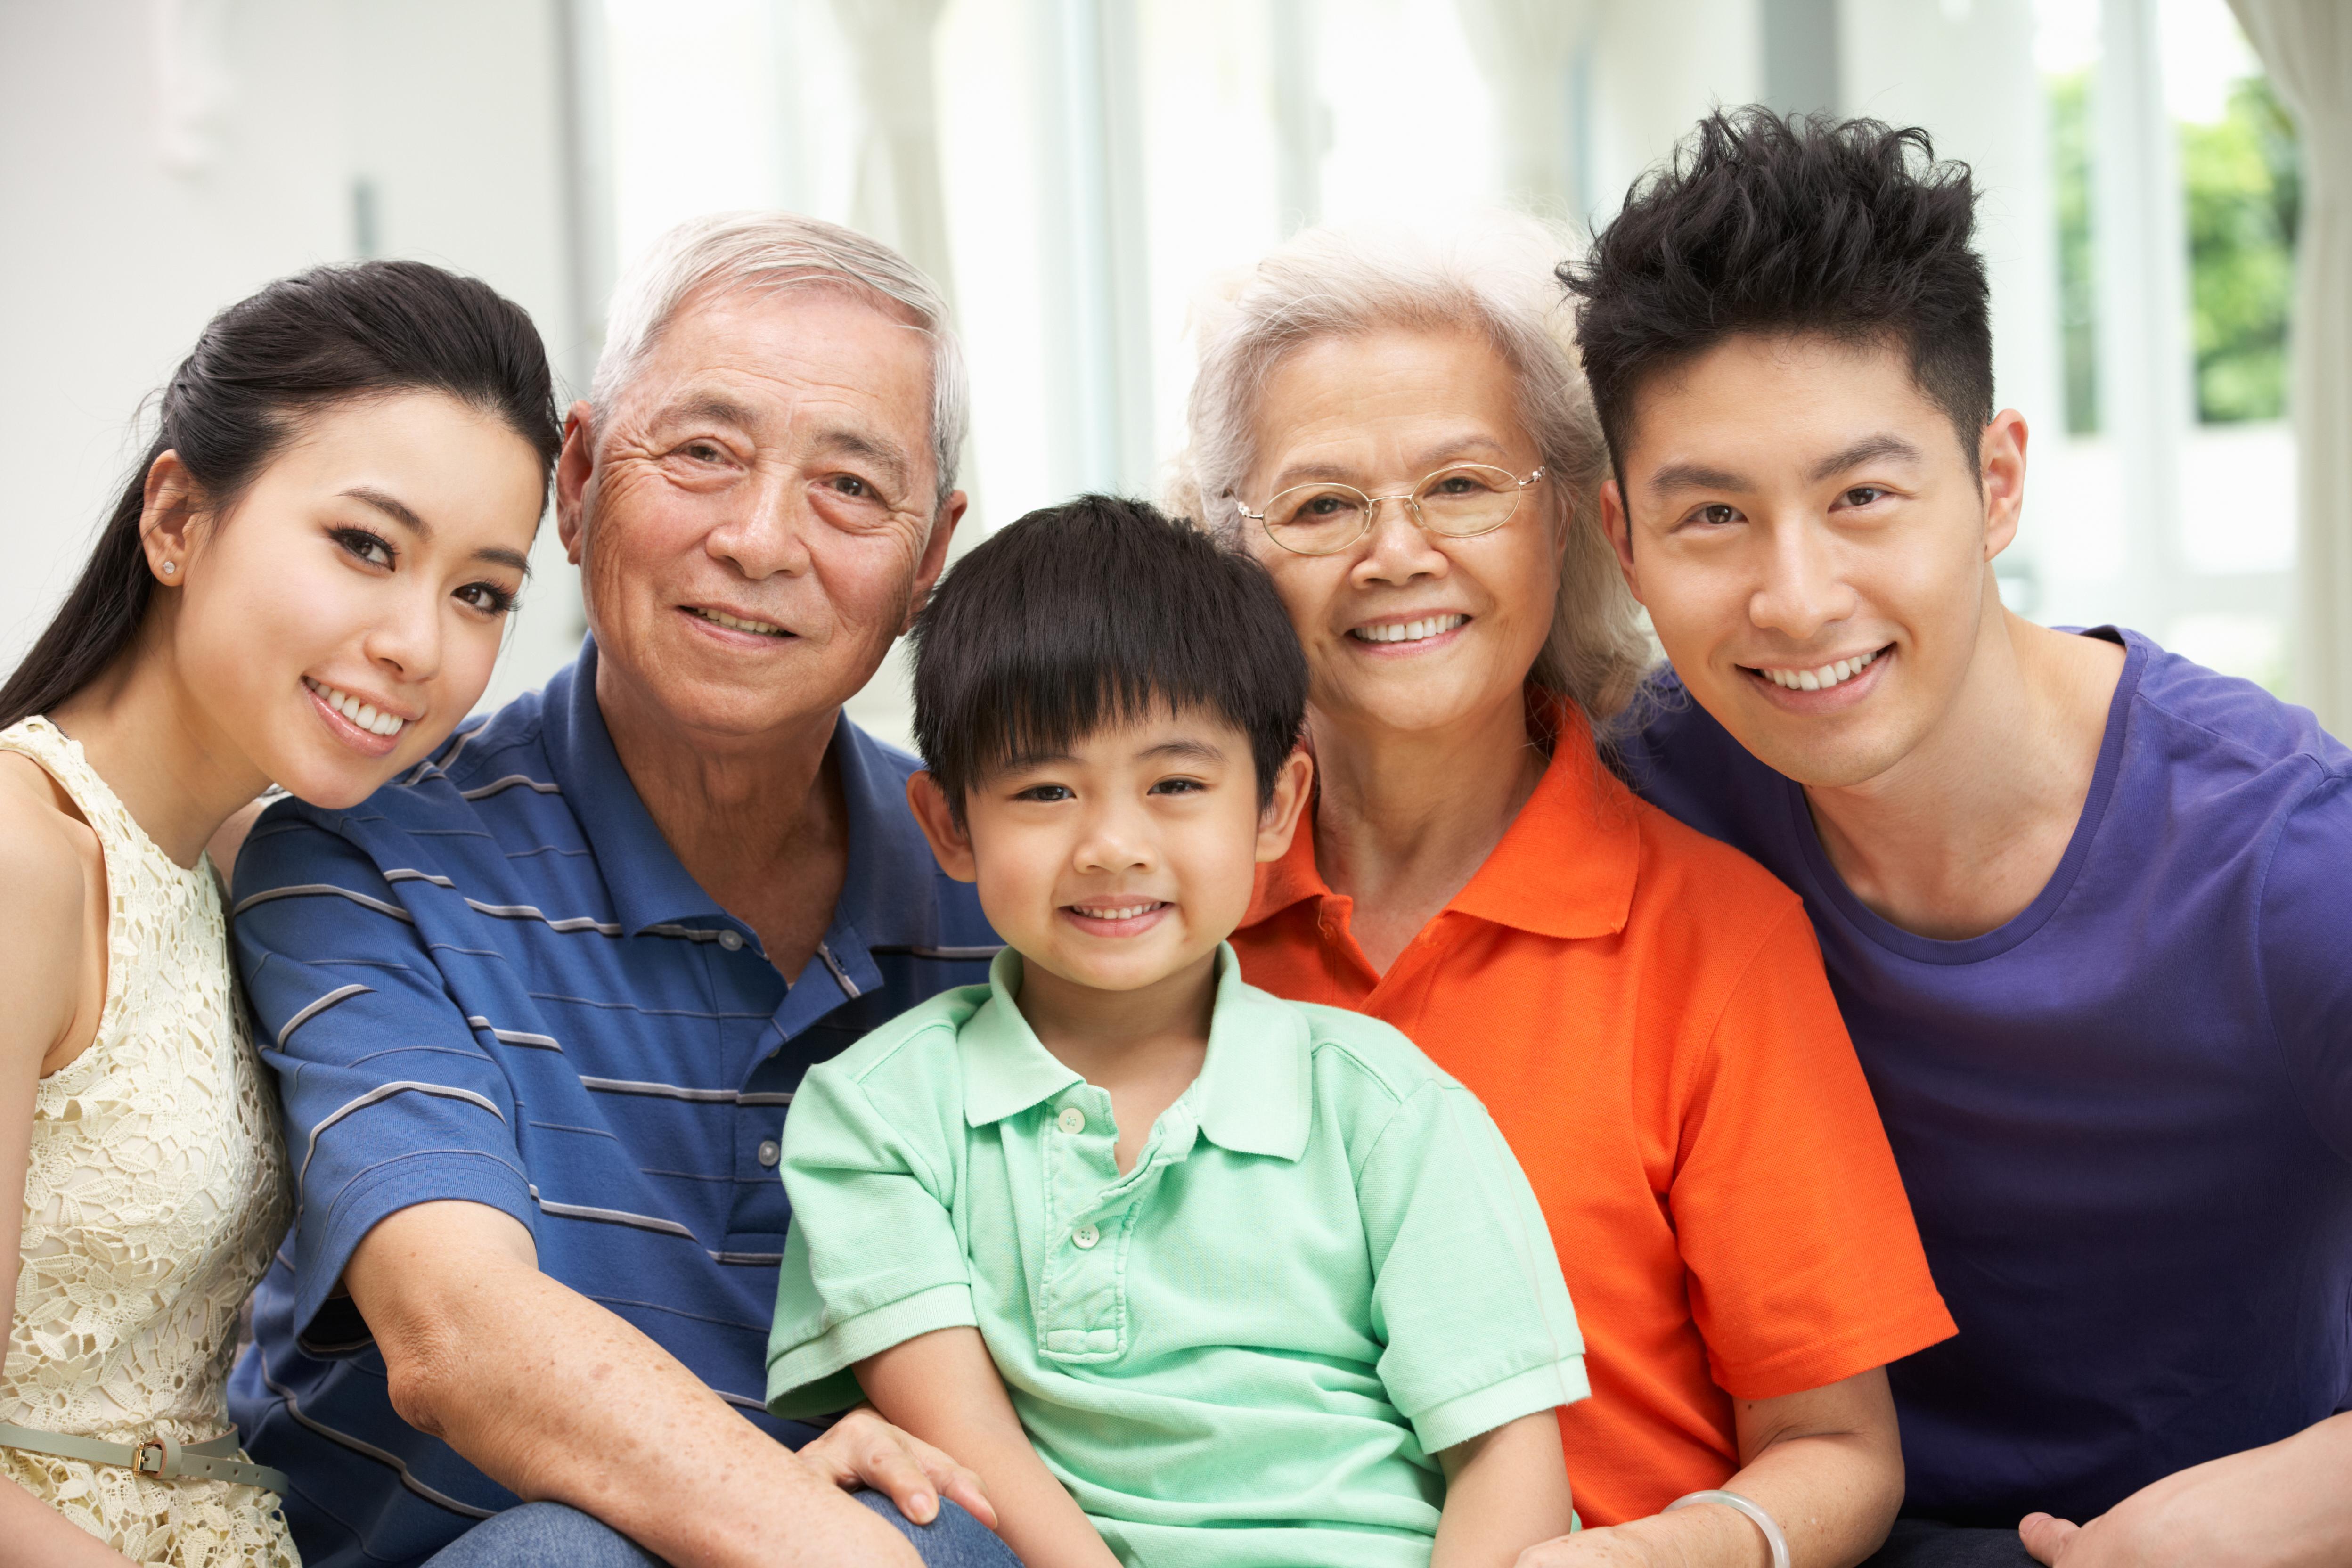 family portrait multi-generations